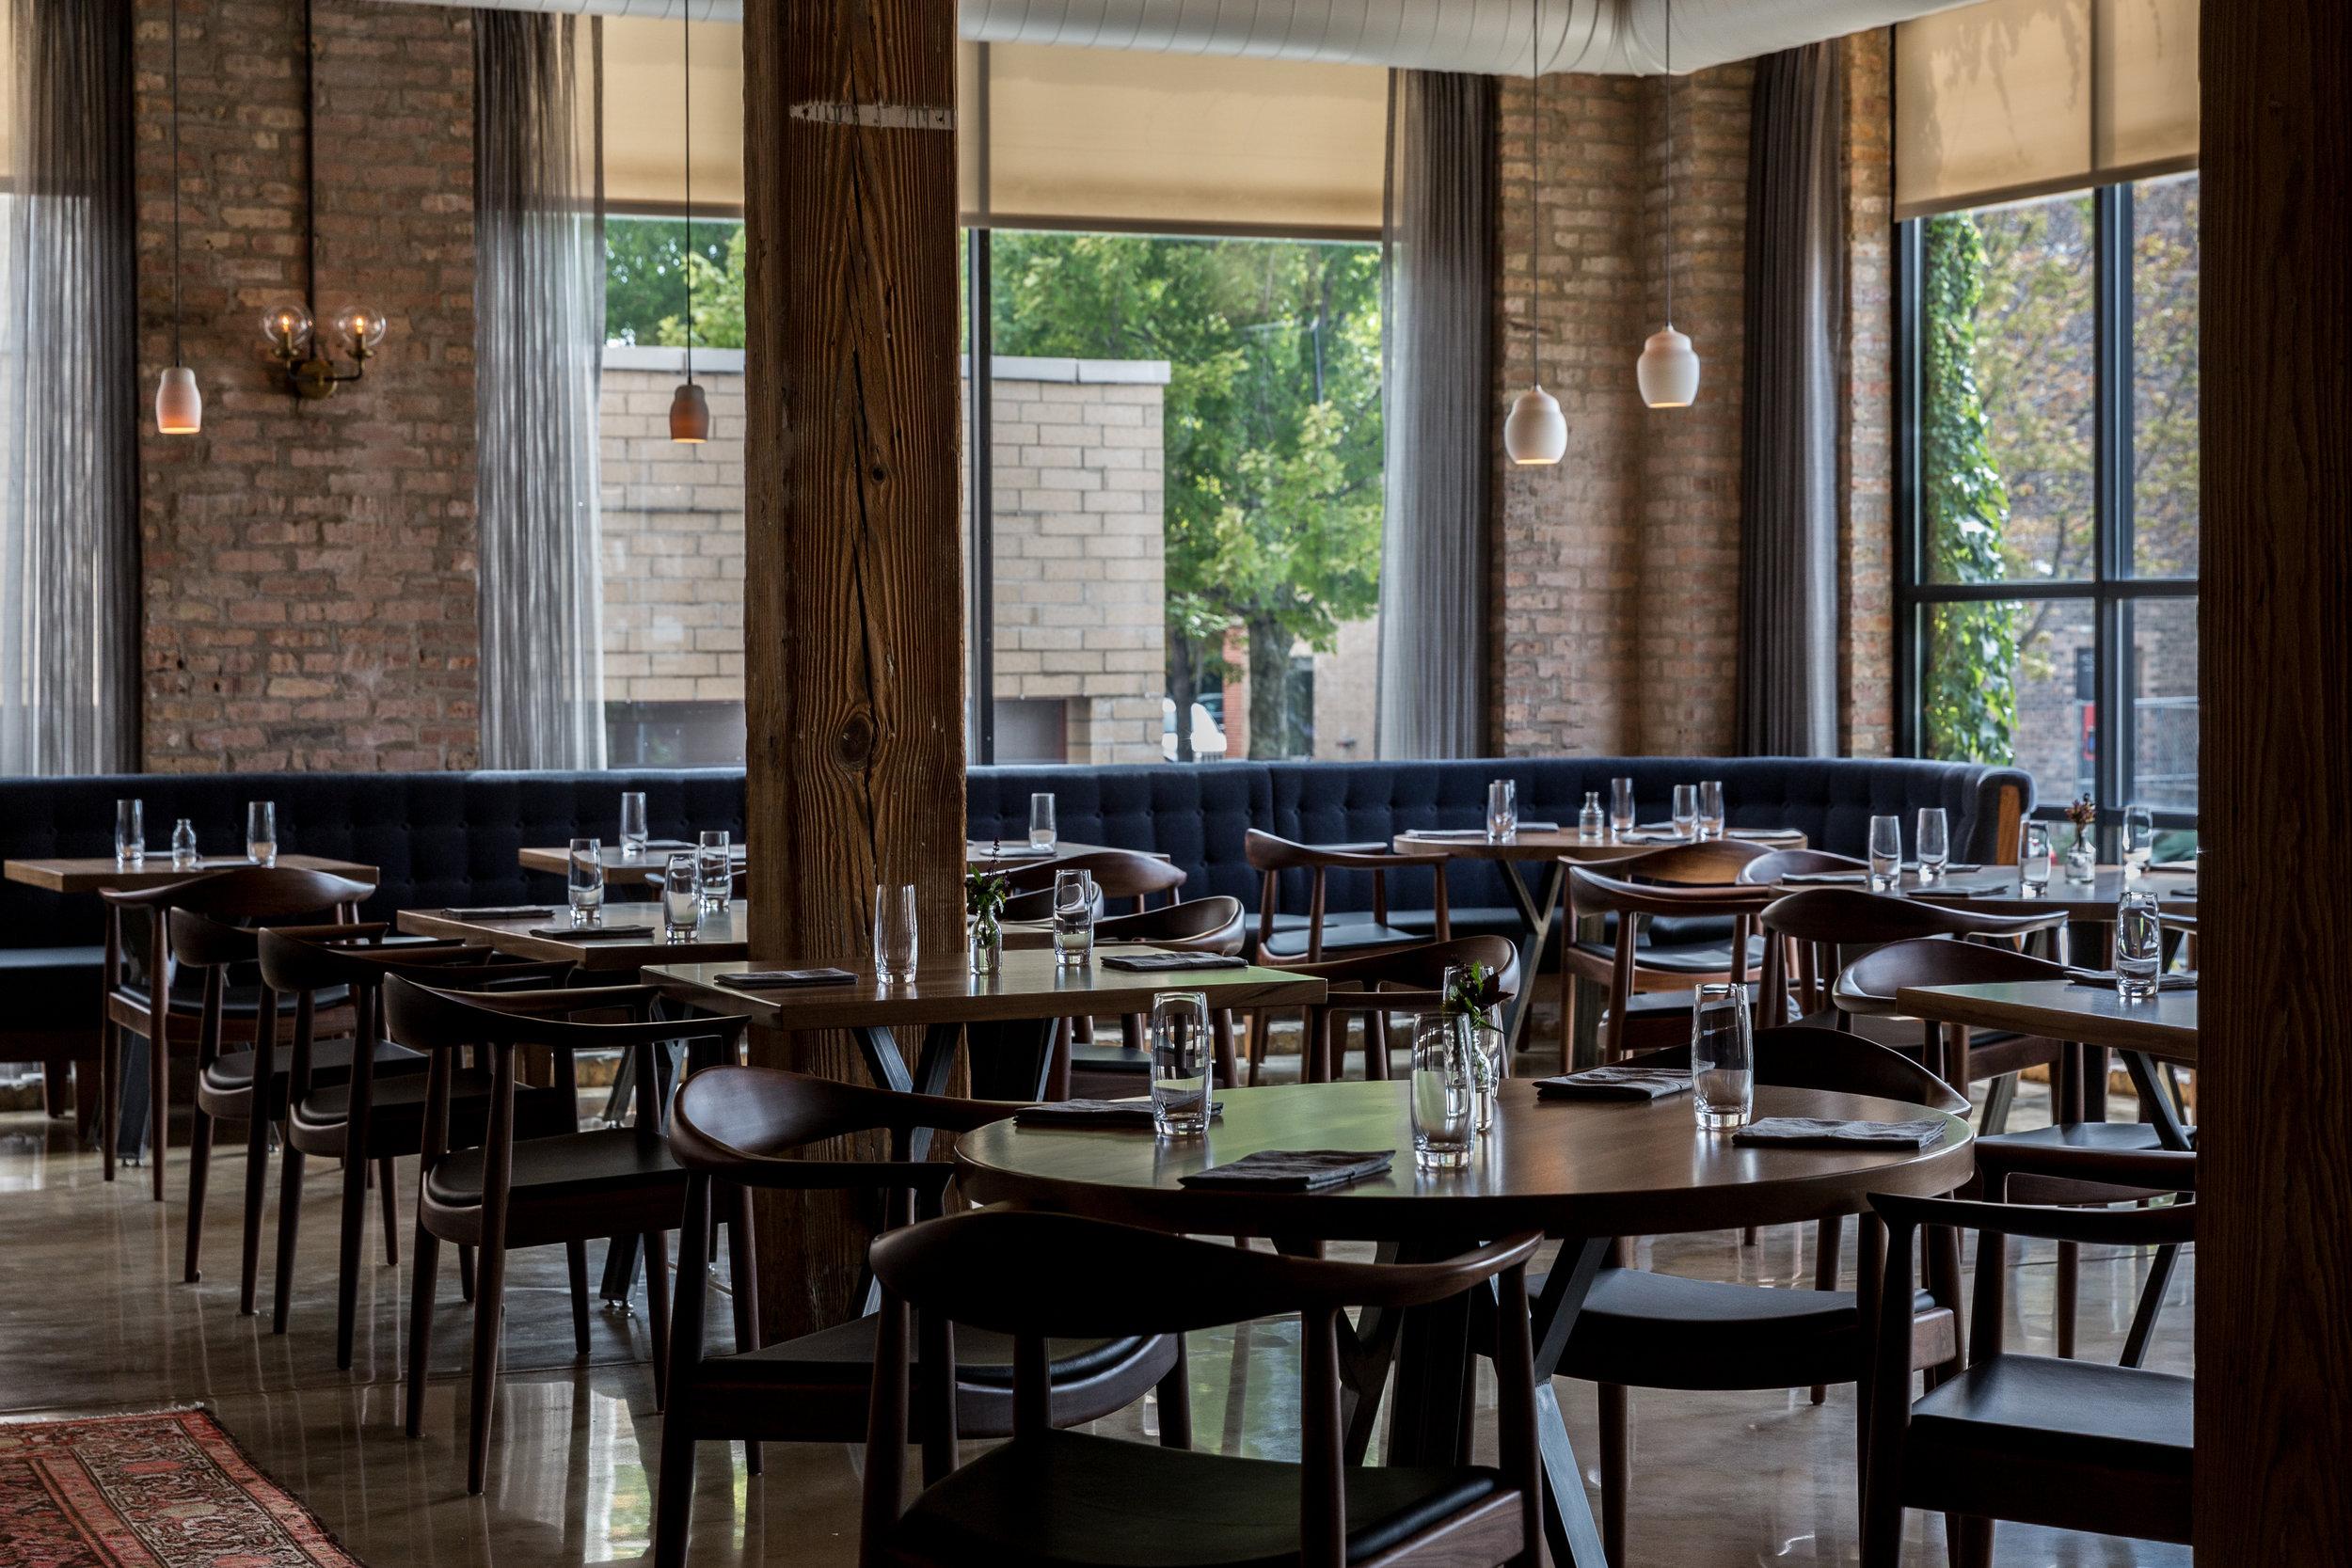 studio-saint-bars-and-restaurants-smyth-and-the-loyalist-washington-dc-5